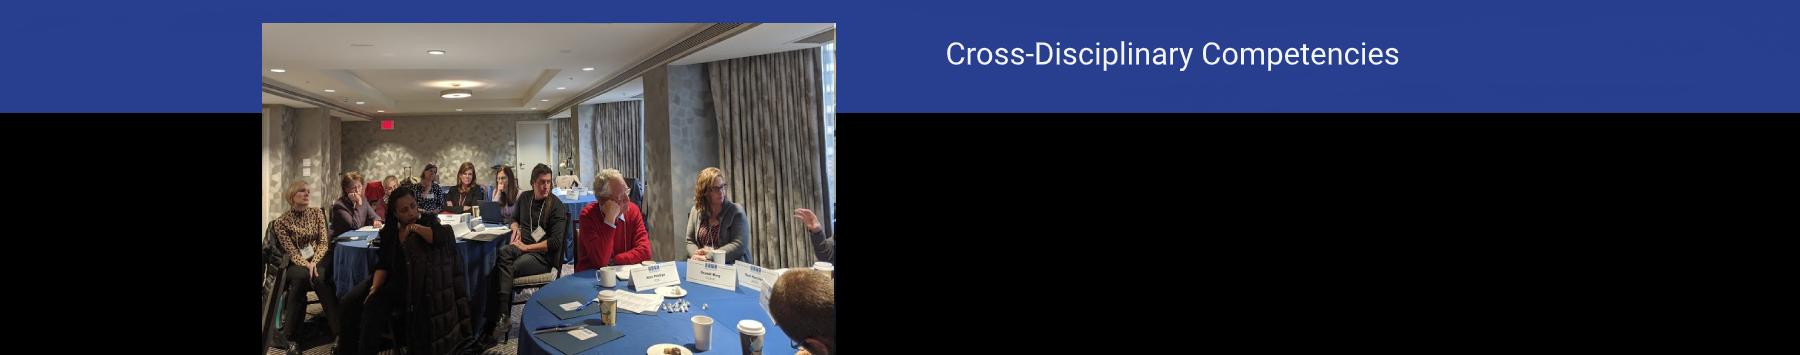 Cross-Disciplinary Competencies Alignment Header